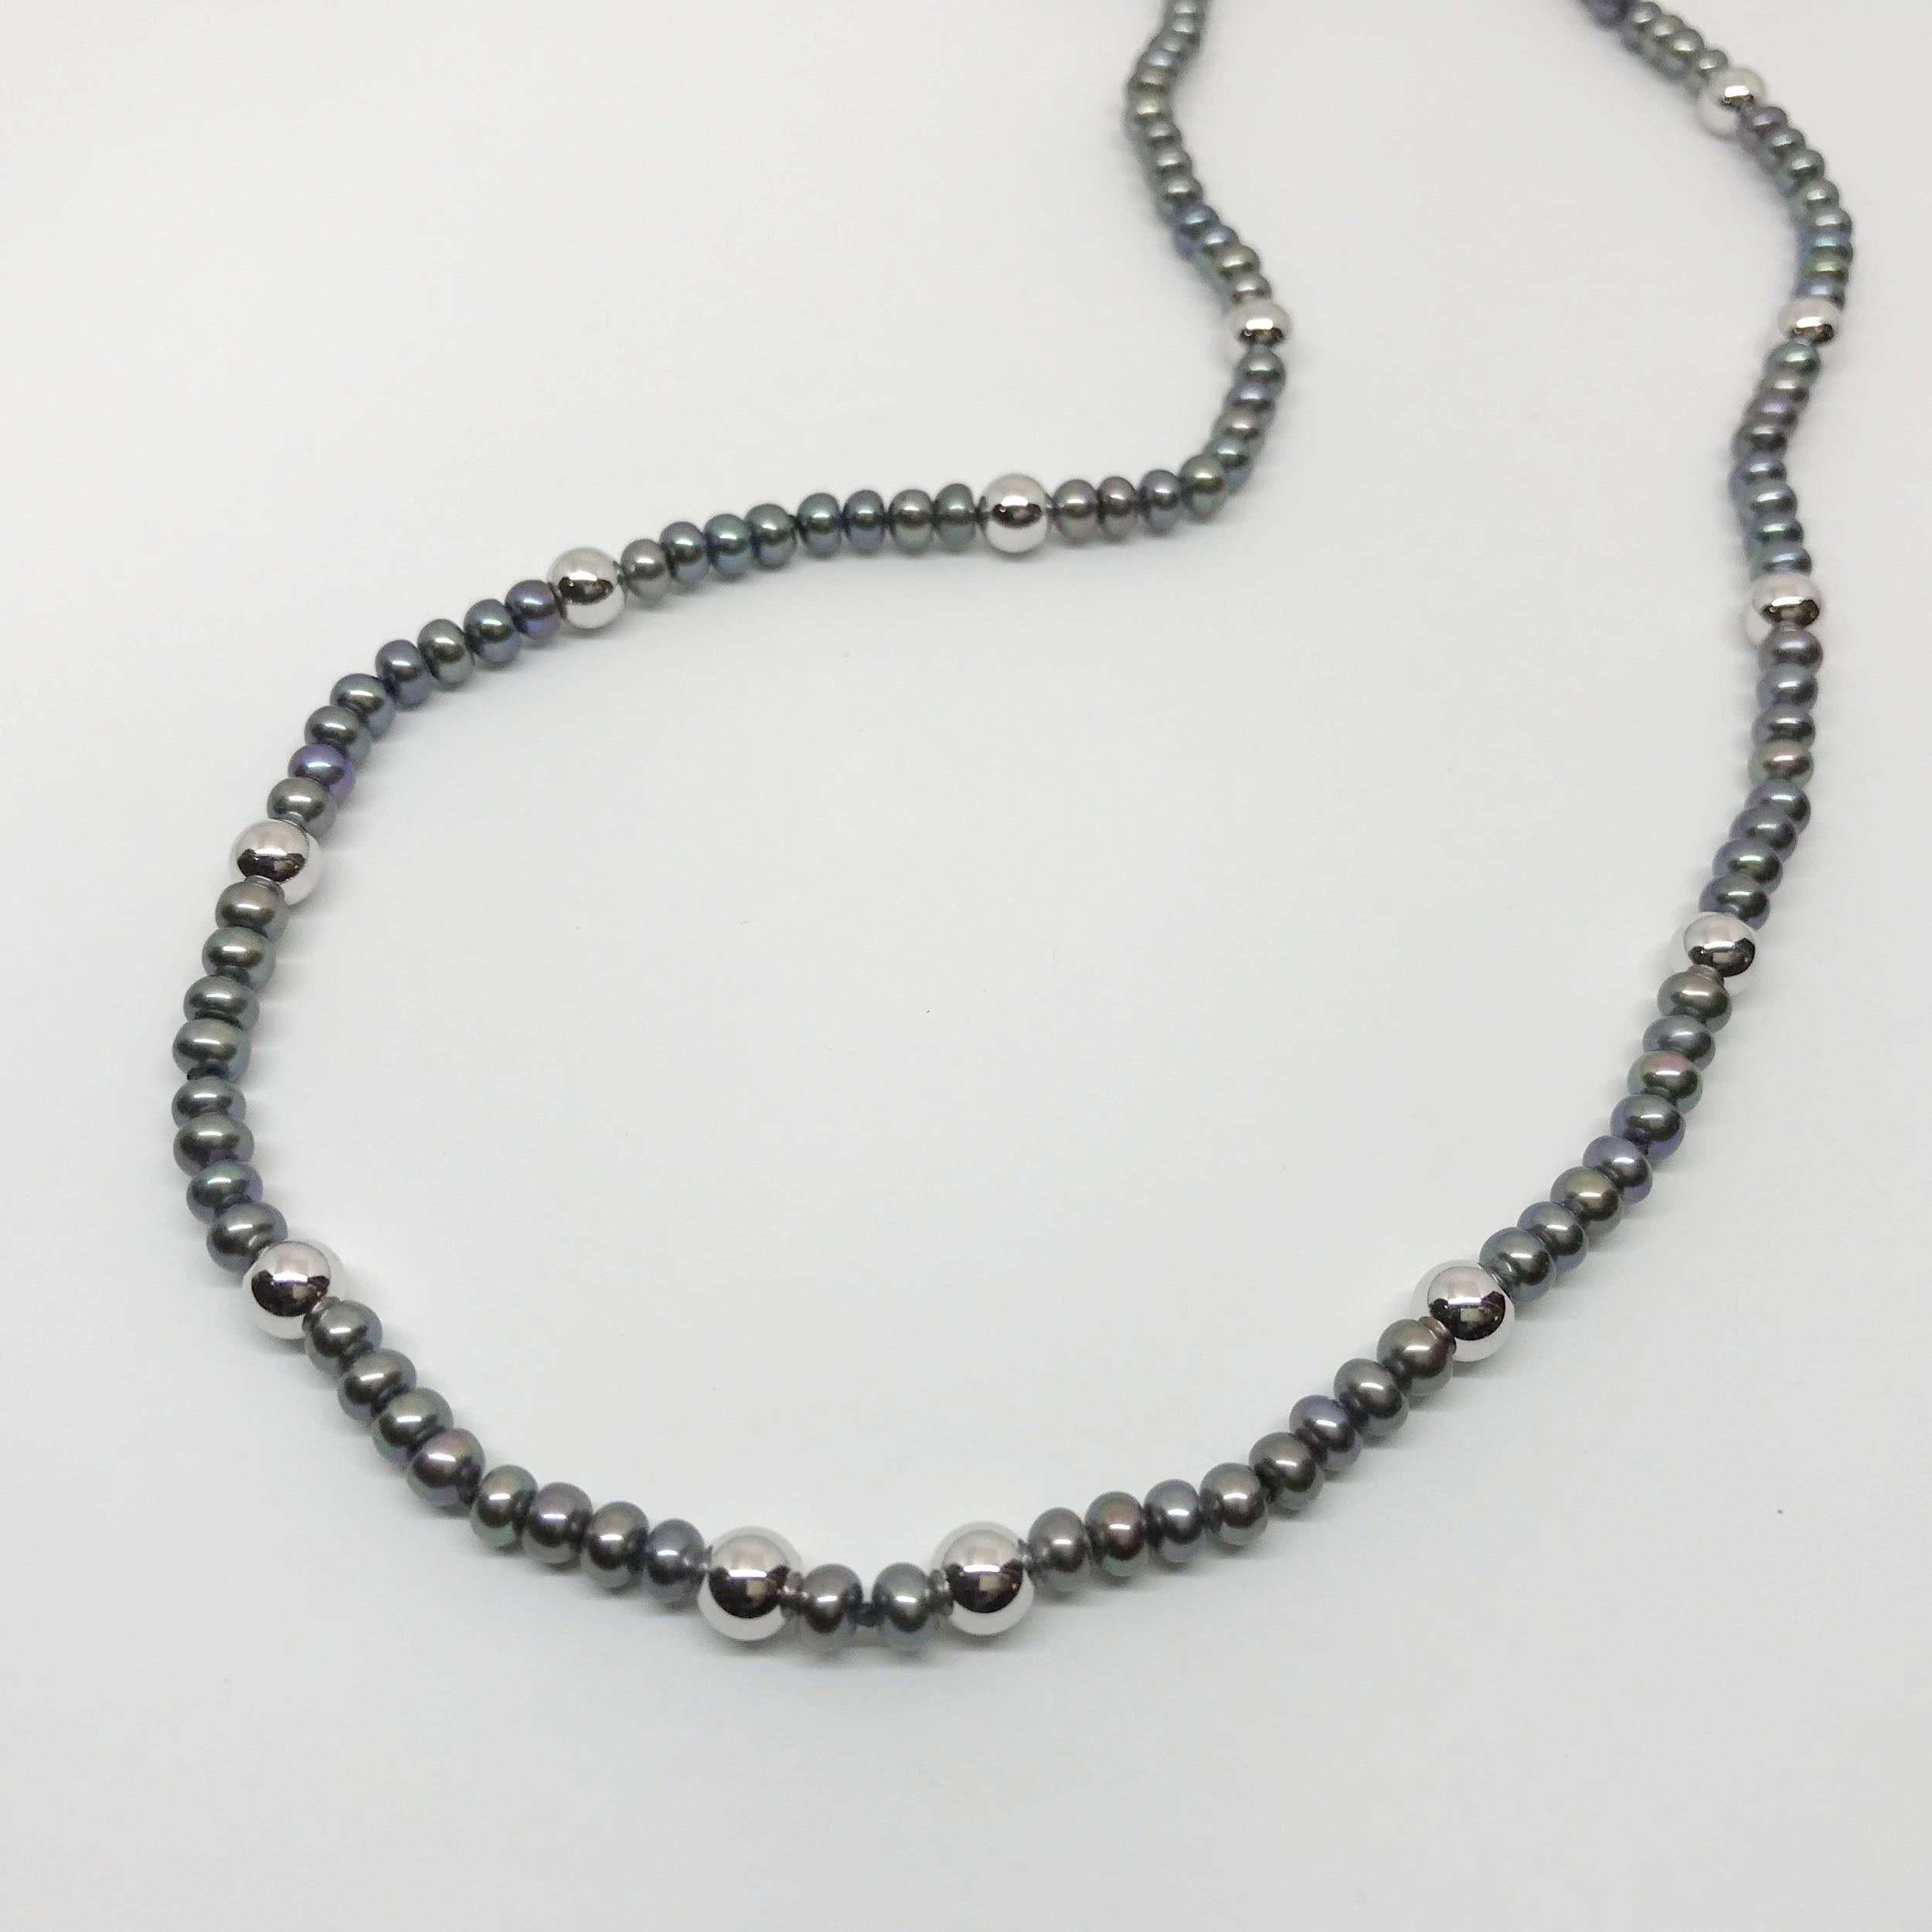 <b>Black FW Pearls w. Gold Beads</b><br>$528<br>Twelve 6mm WG Ball Beads<br>14K WG Clasp